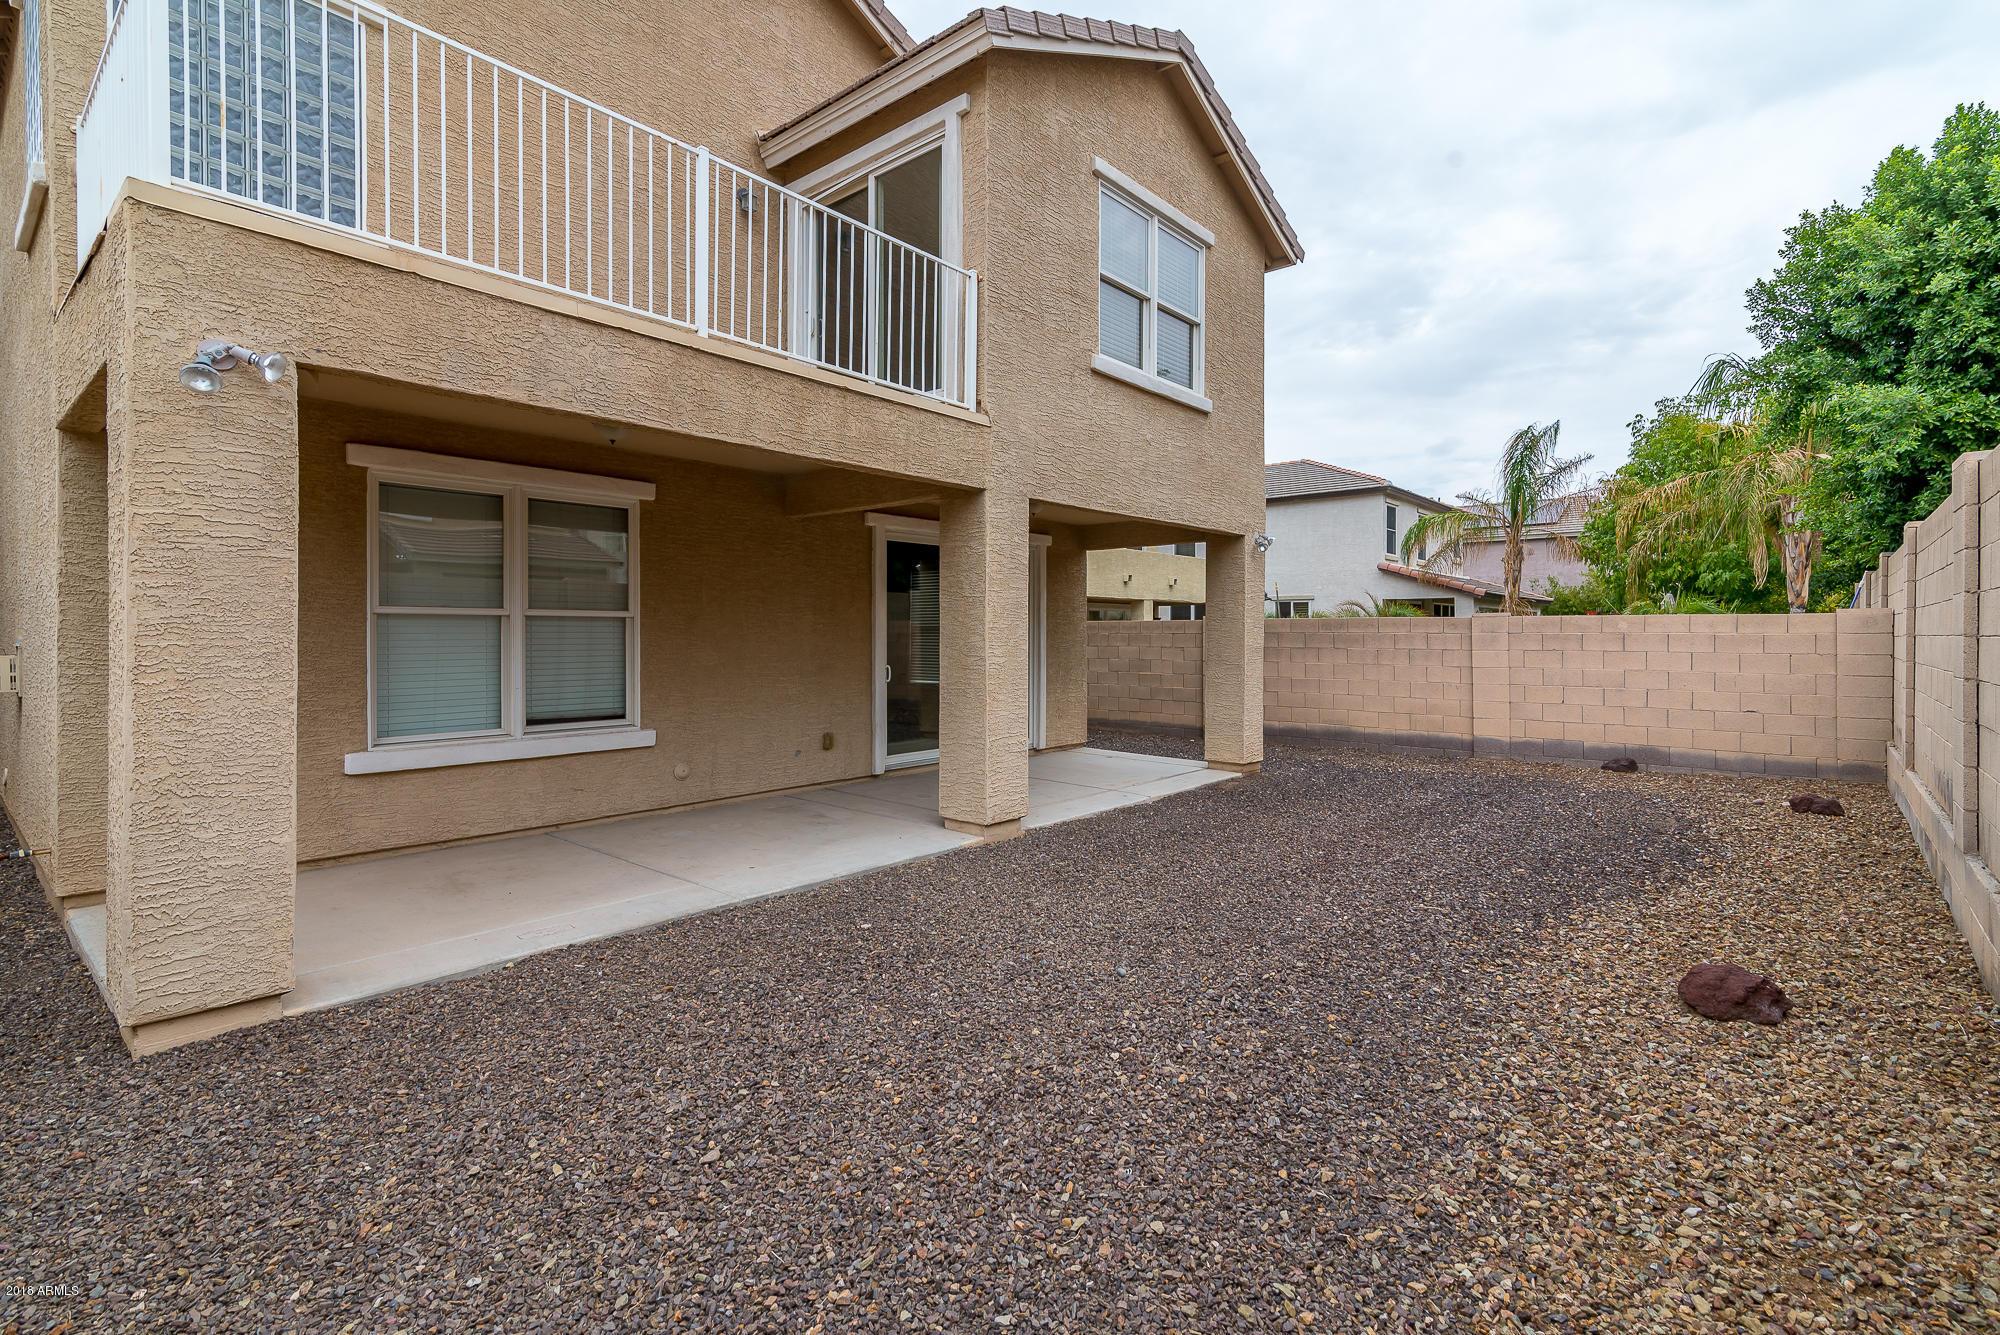 MLS 5790667 2323 E LA SALLE Street, Phoenix, AZ 85040 Phoenix AZ Copper Leaf